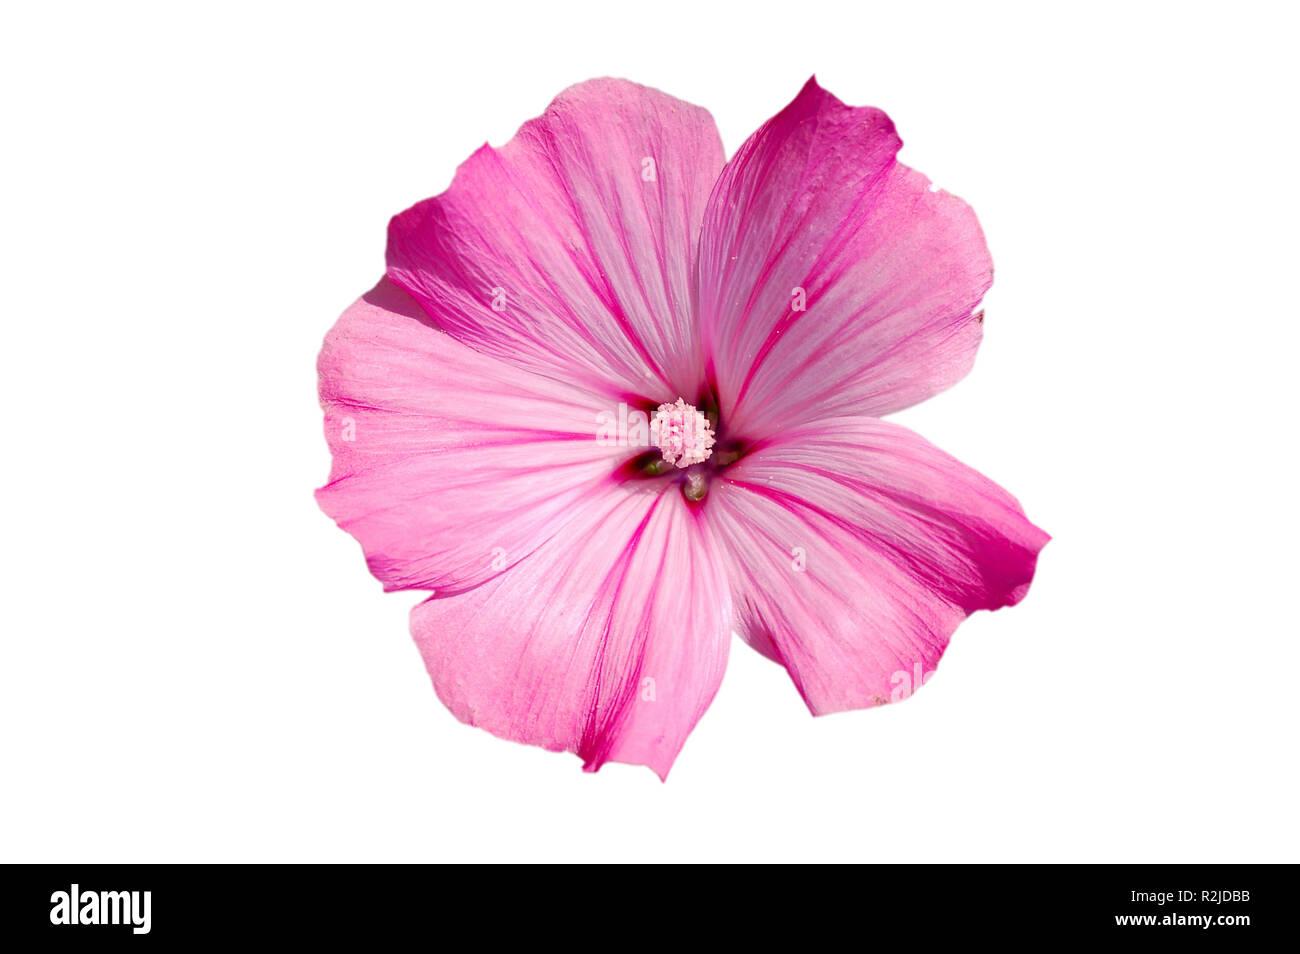 pink mallow blossom free Stock Photo